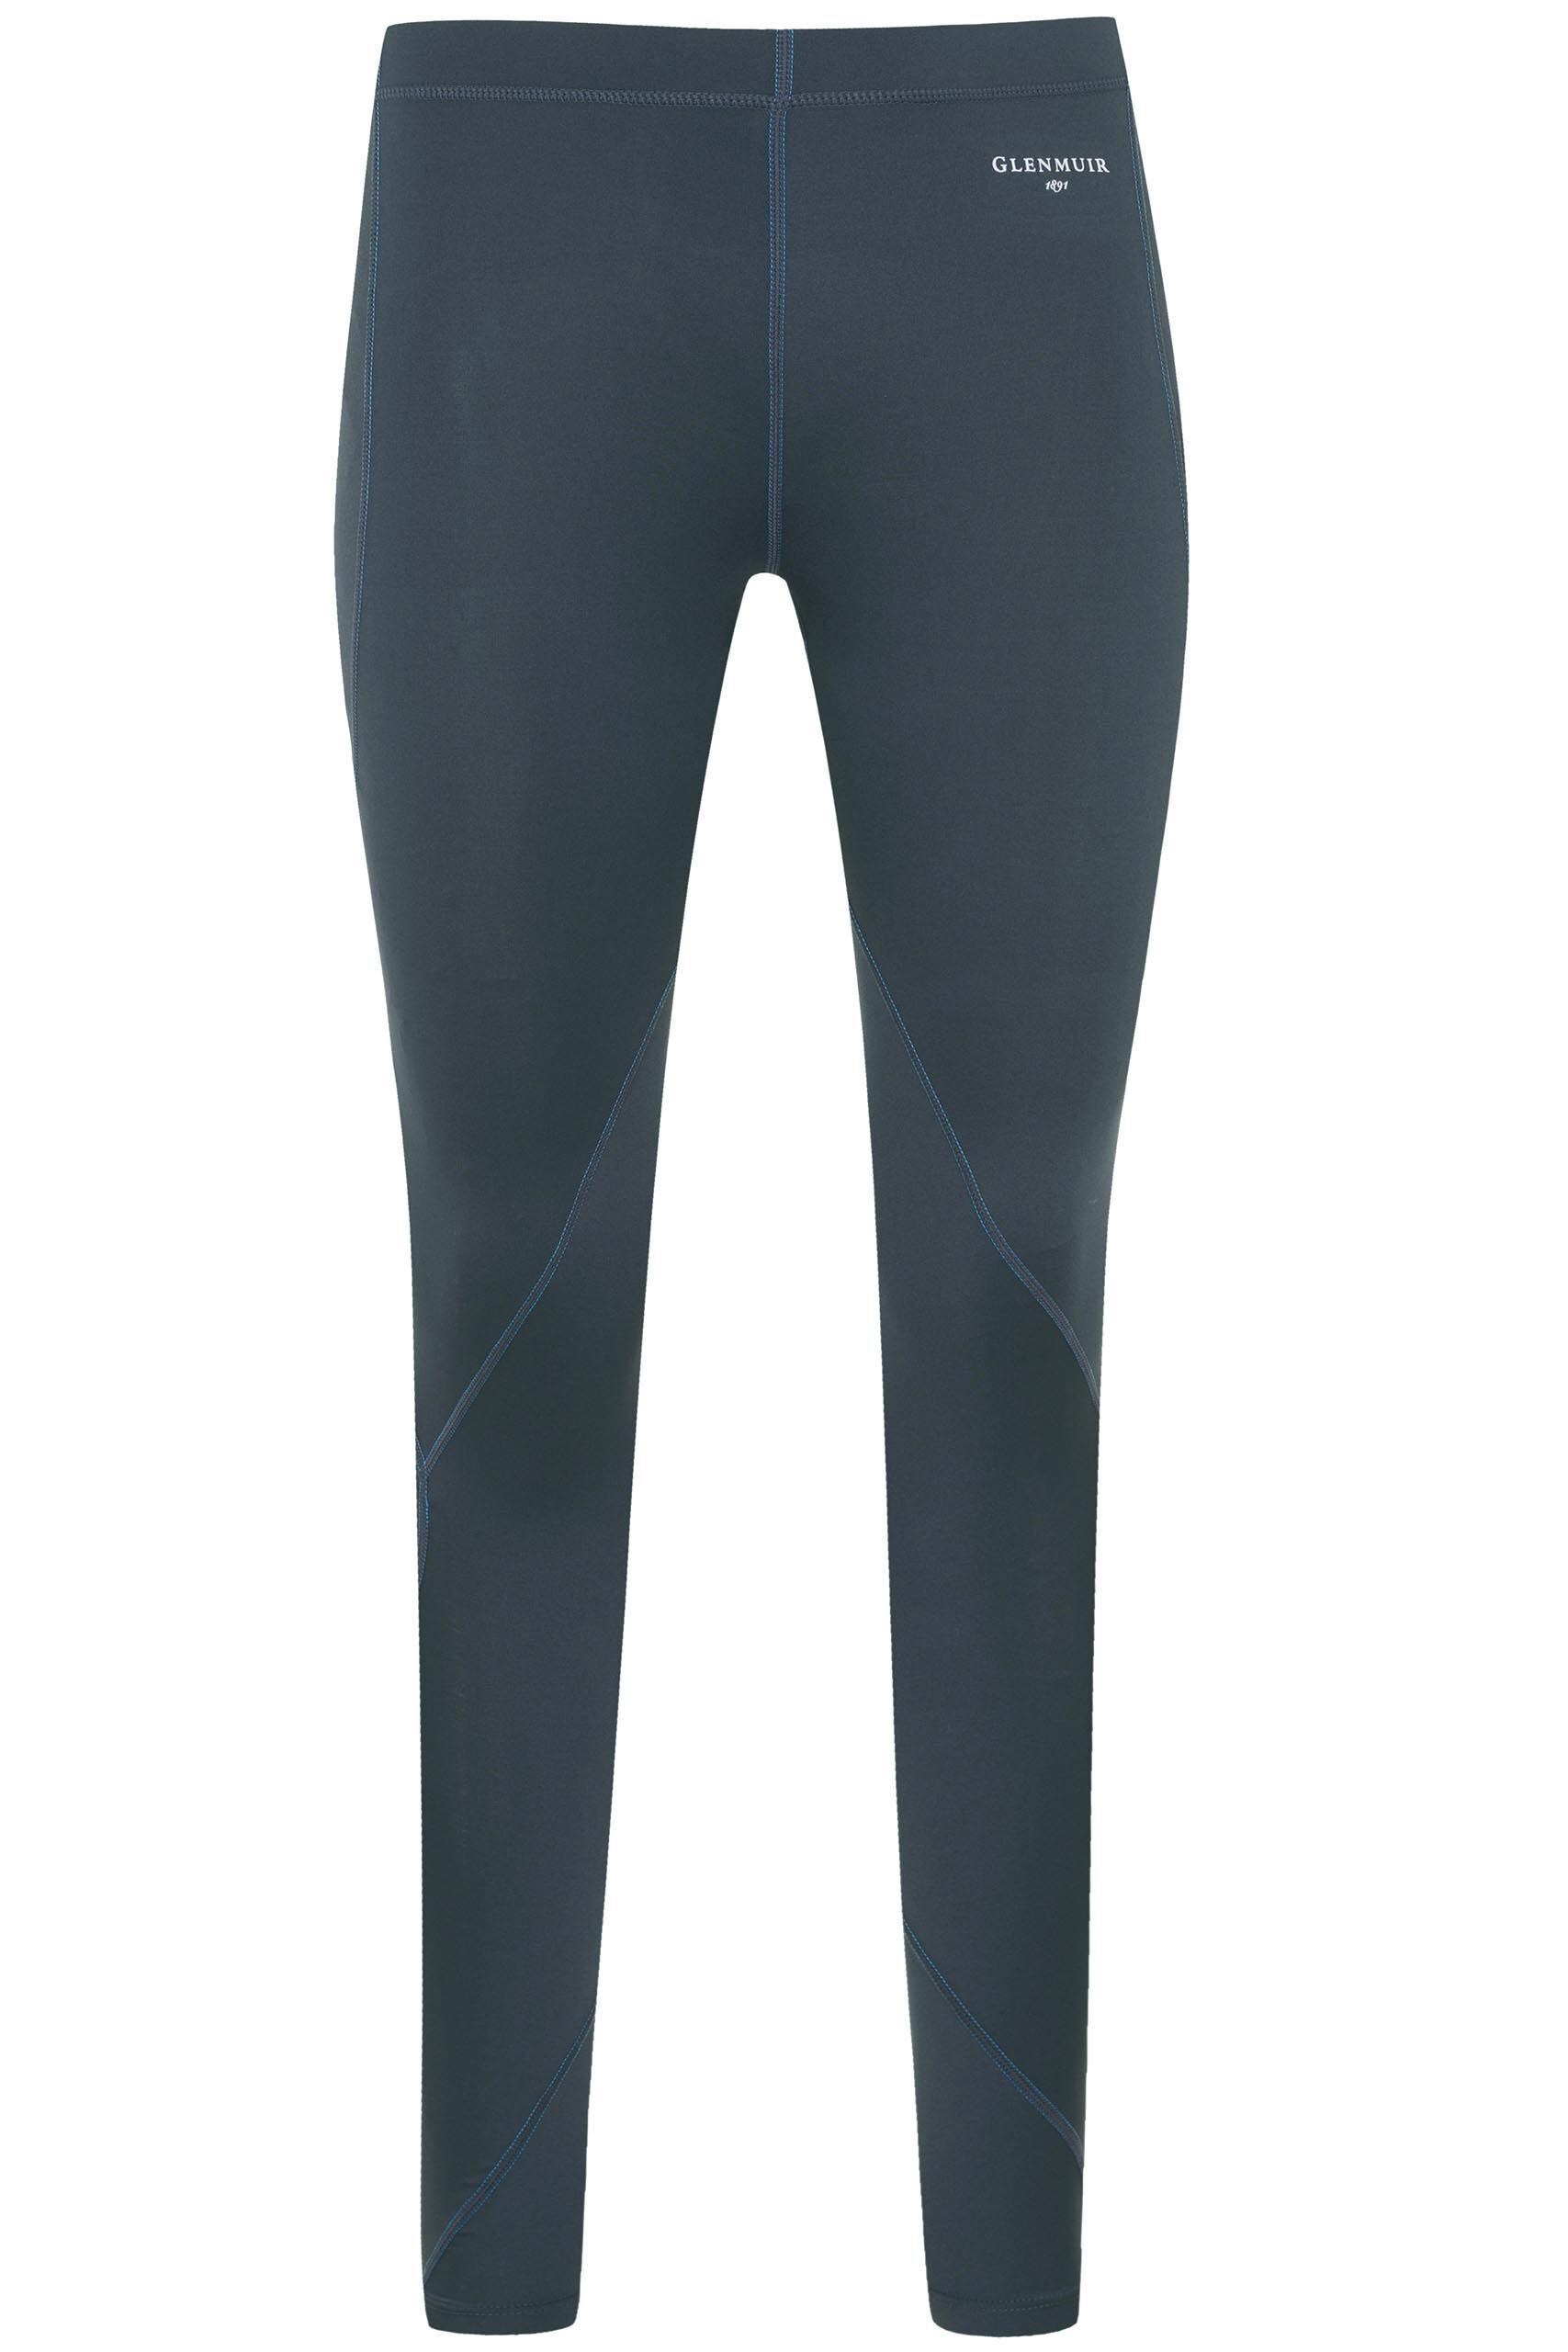 Image of 1 Pack Grey Compression Base Layer Leggings Ladies 8-10 Ladies - Glenmuir